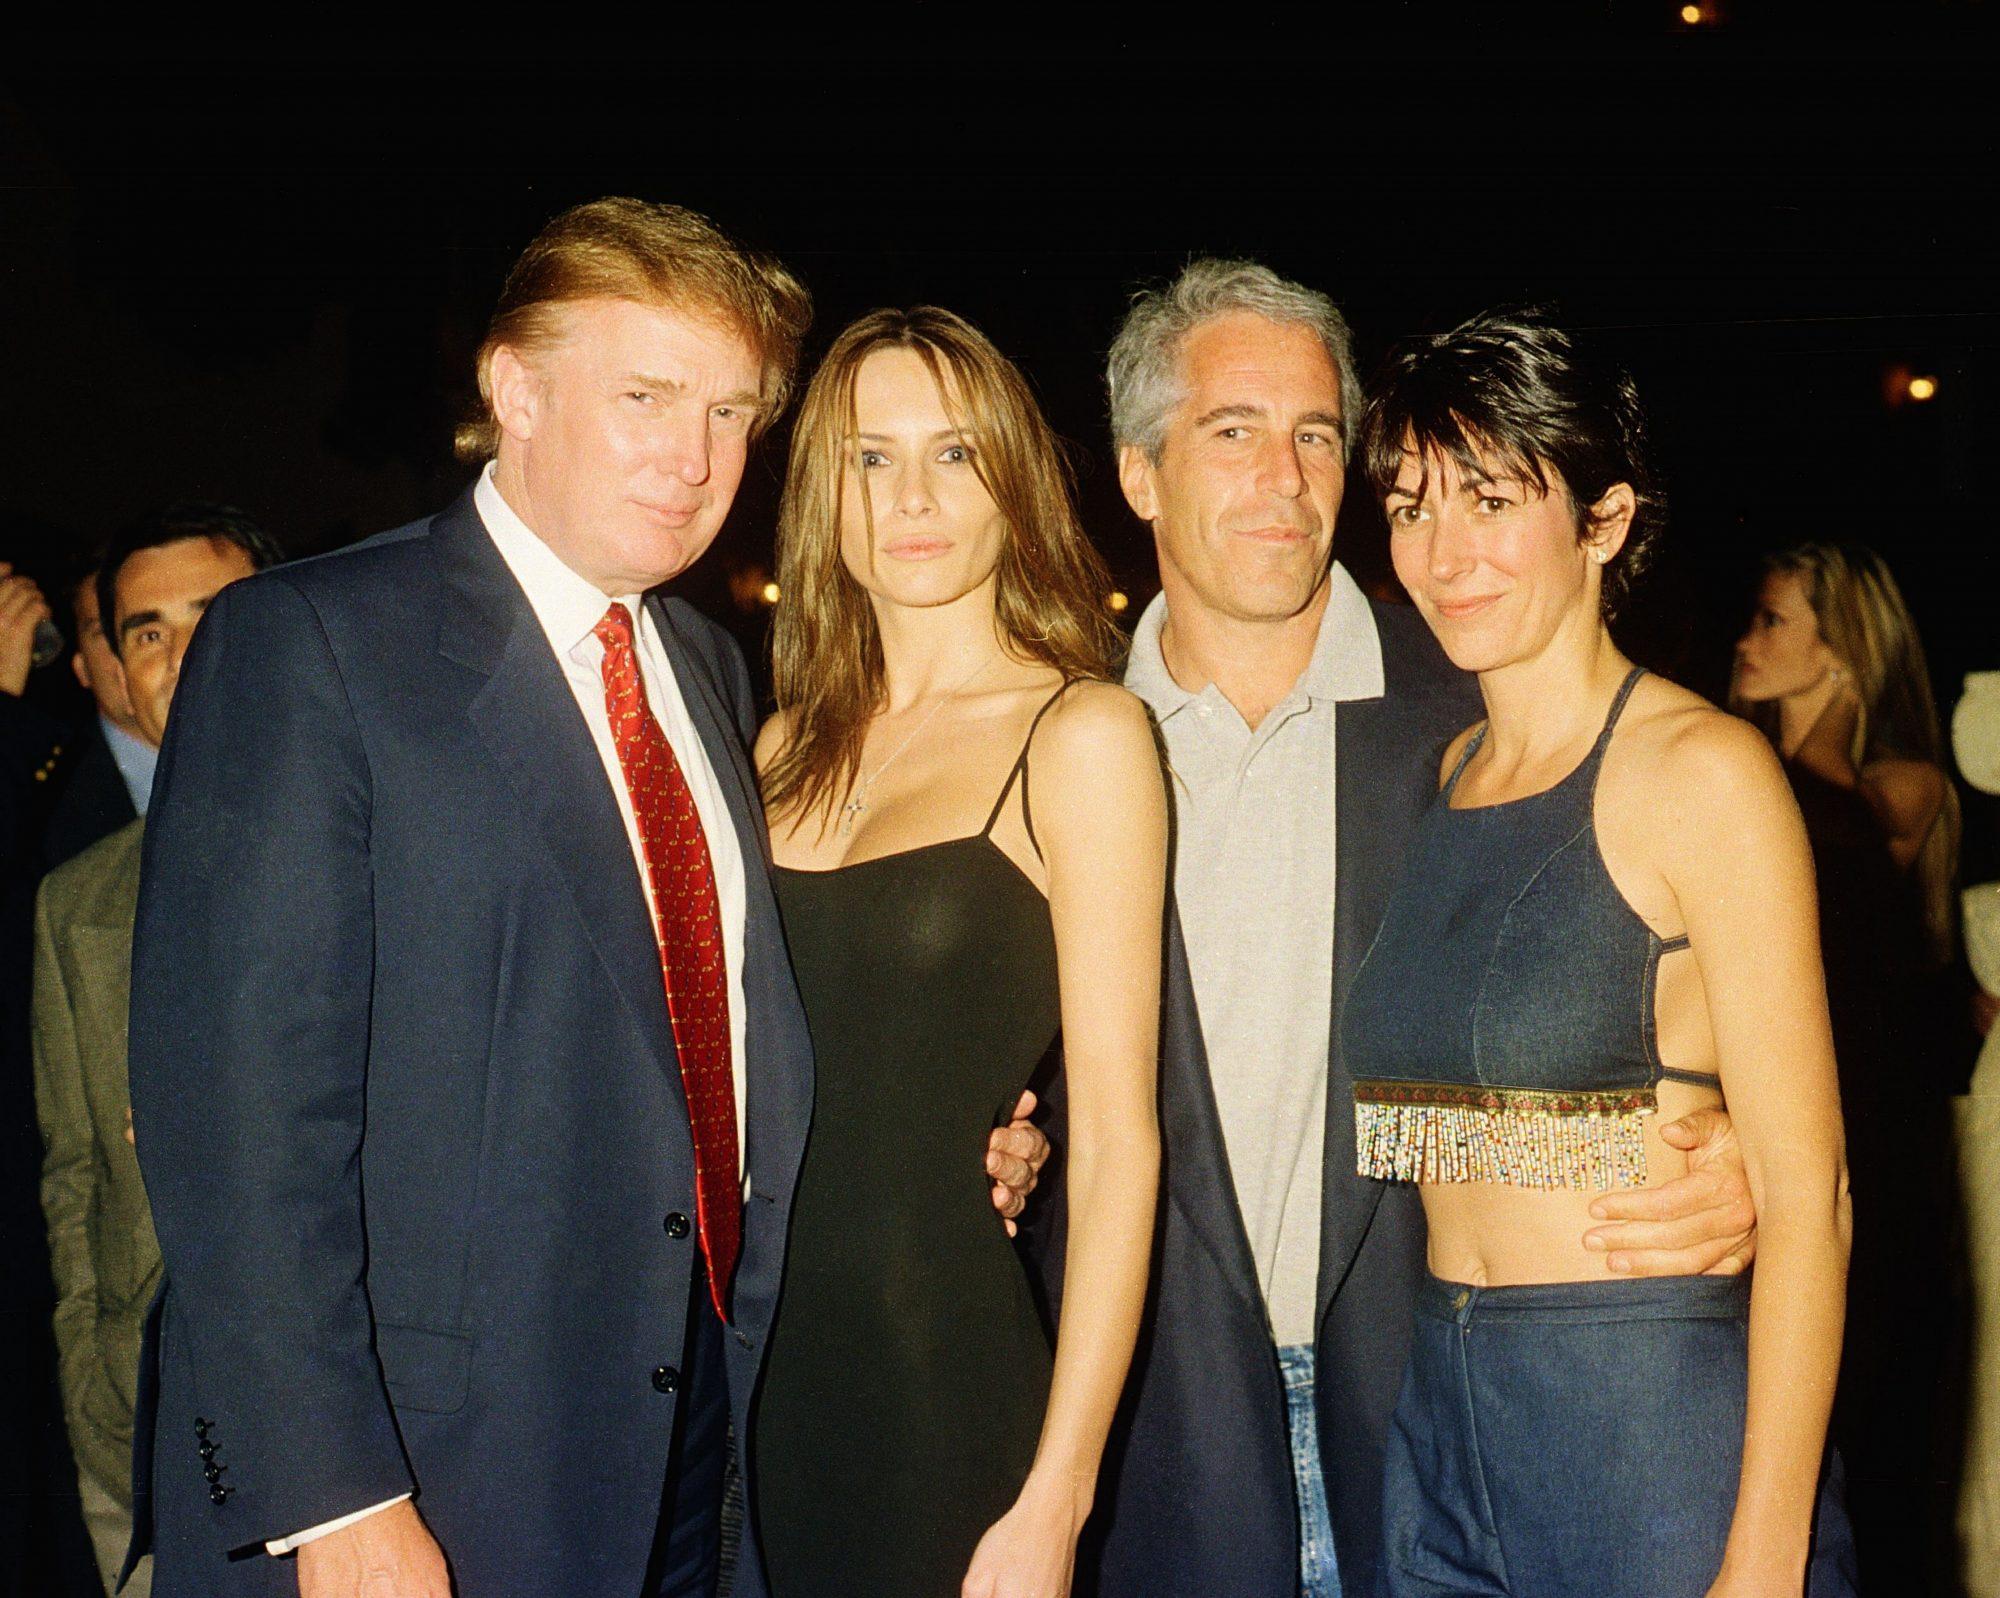 Donald Trump, Melania Knauss, Jeffrey Epstein, Ghislaine Maxwell